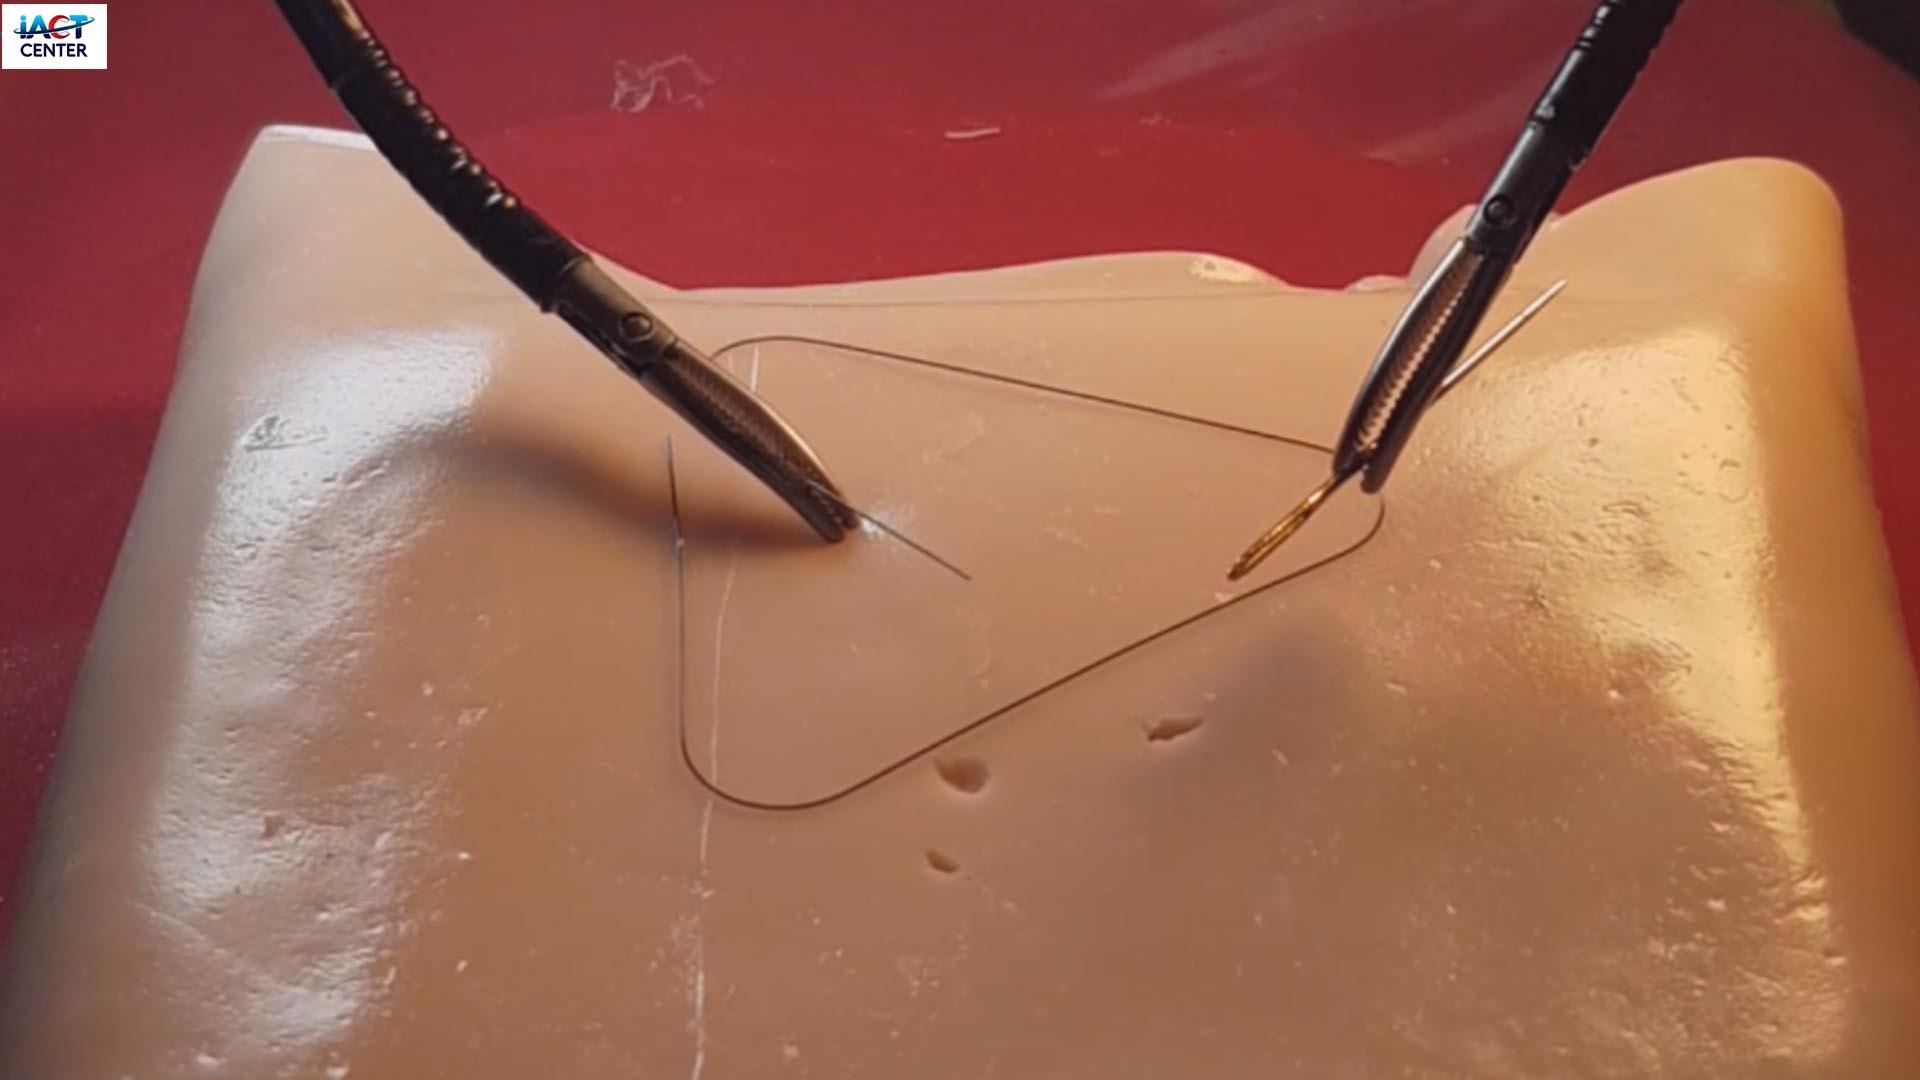 Robotic surgery on phantom and ex-vivo animal tissue